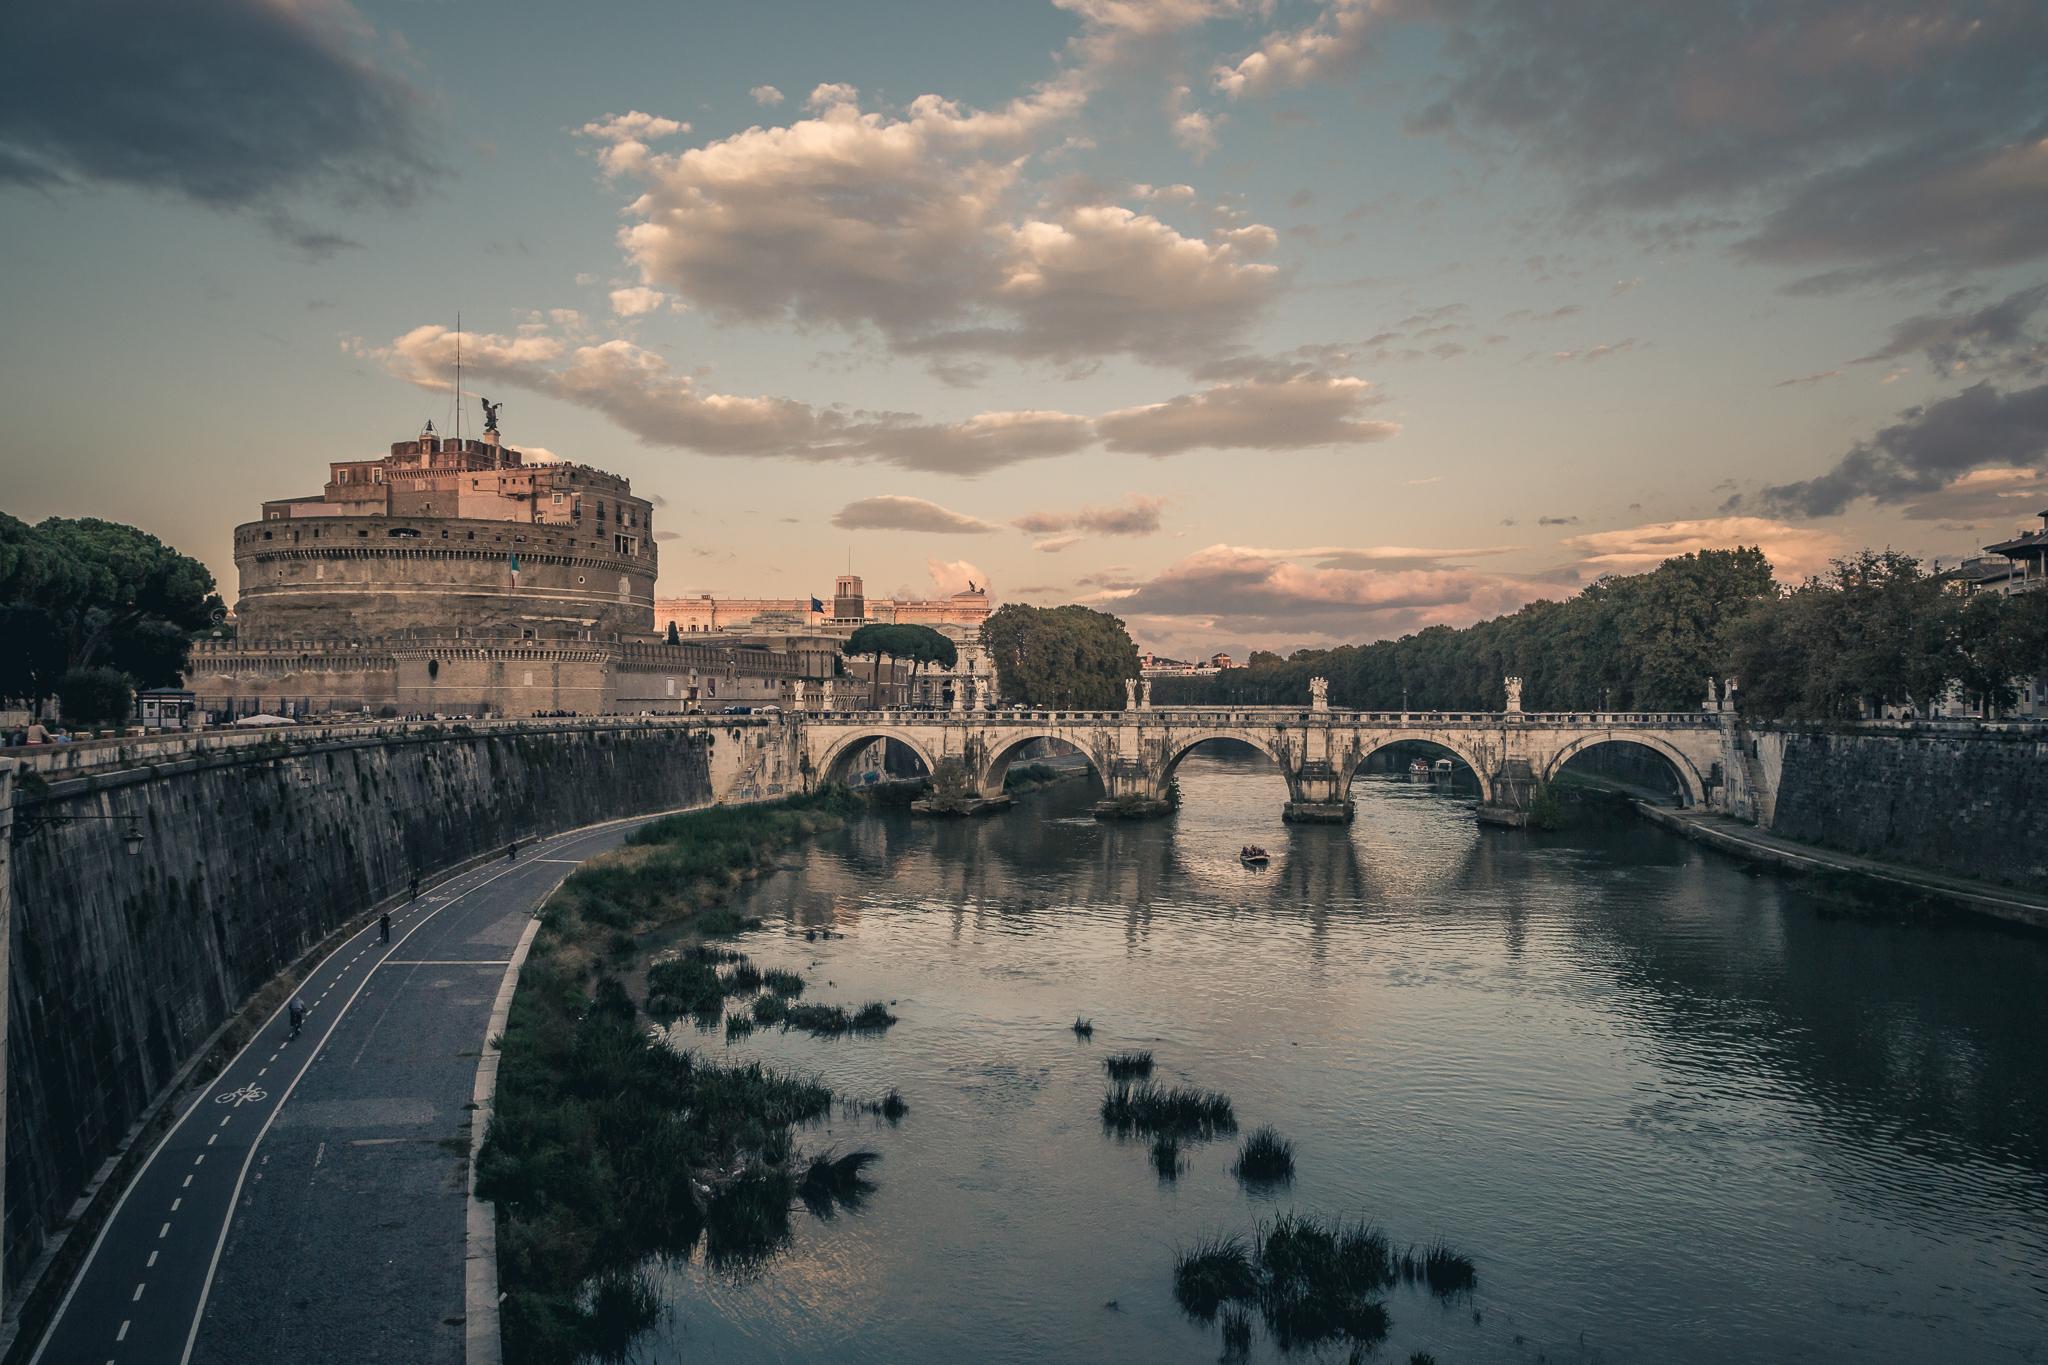 Roma_2048-0007.jpg